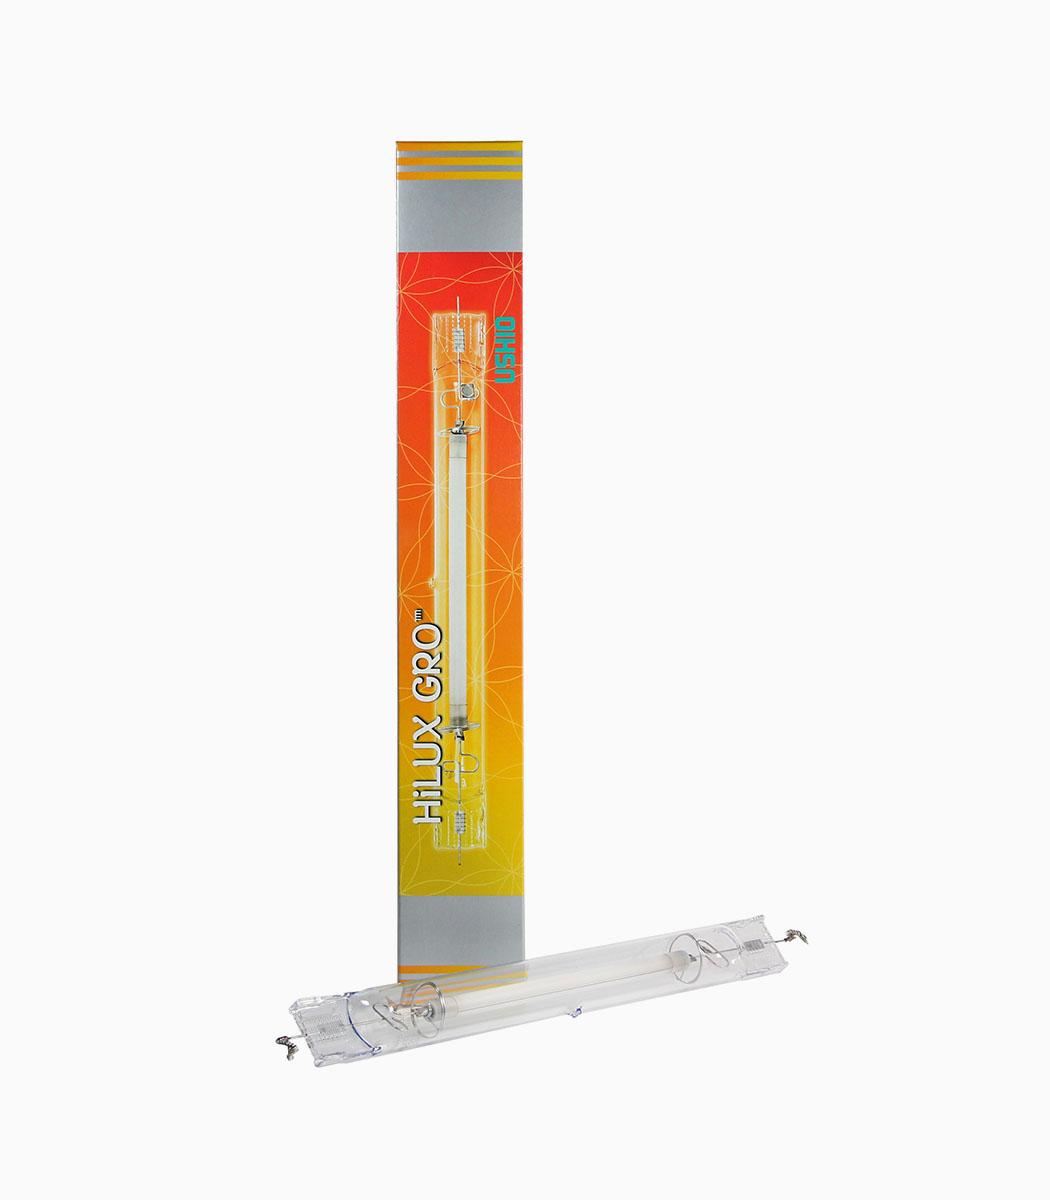 Ushio HiLUX GRO Opti-Red Double-Ended Super High Pressure Sodium (HPS) Lamp 1000W US5002272